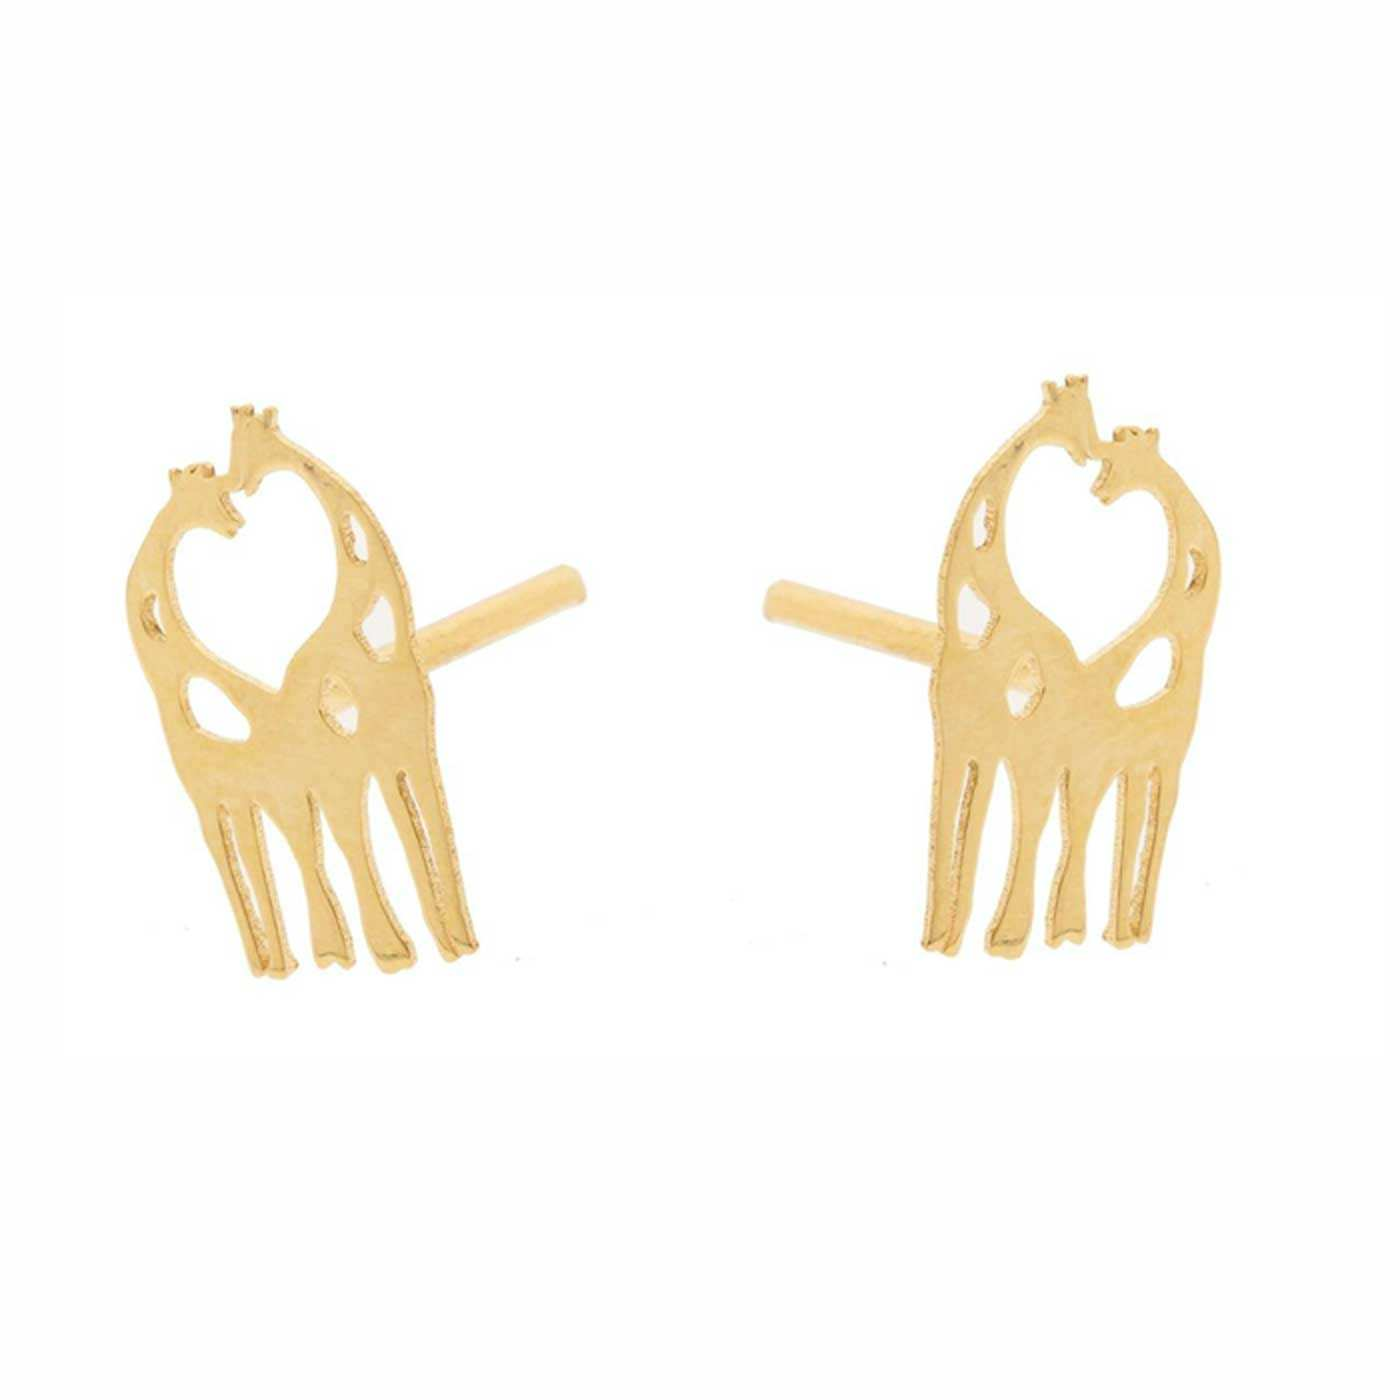 گوشواره طلا 18 عیار زنانه کانیار گالری کد GOA103 -  - 4